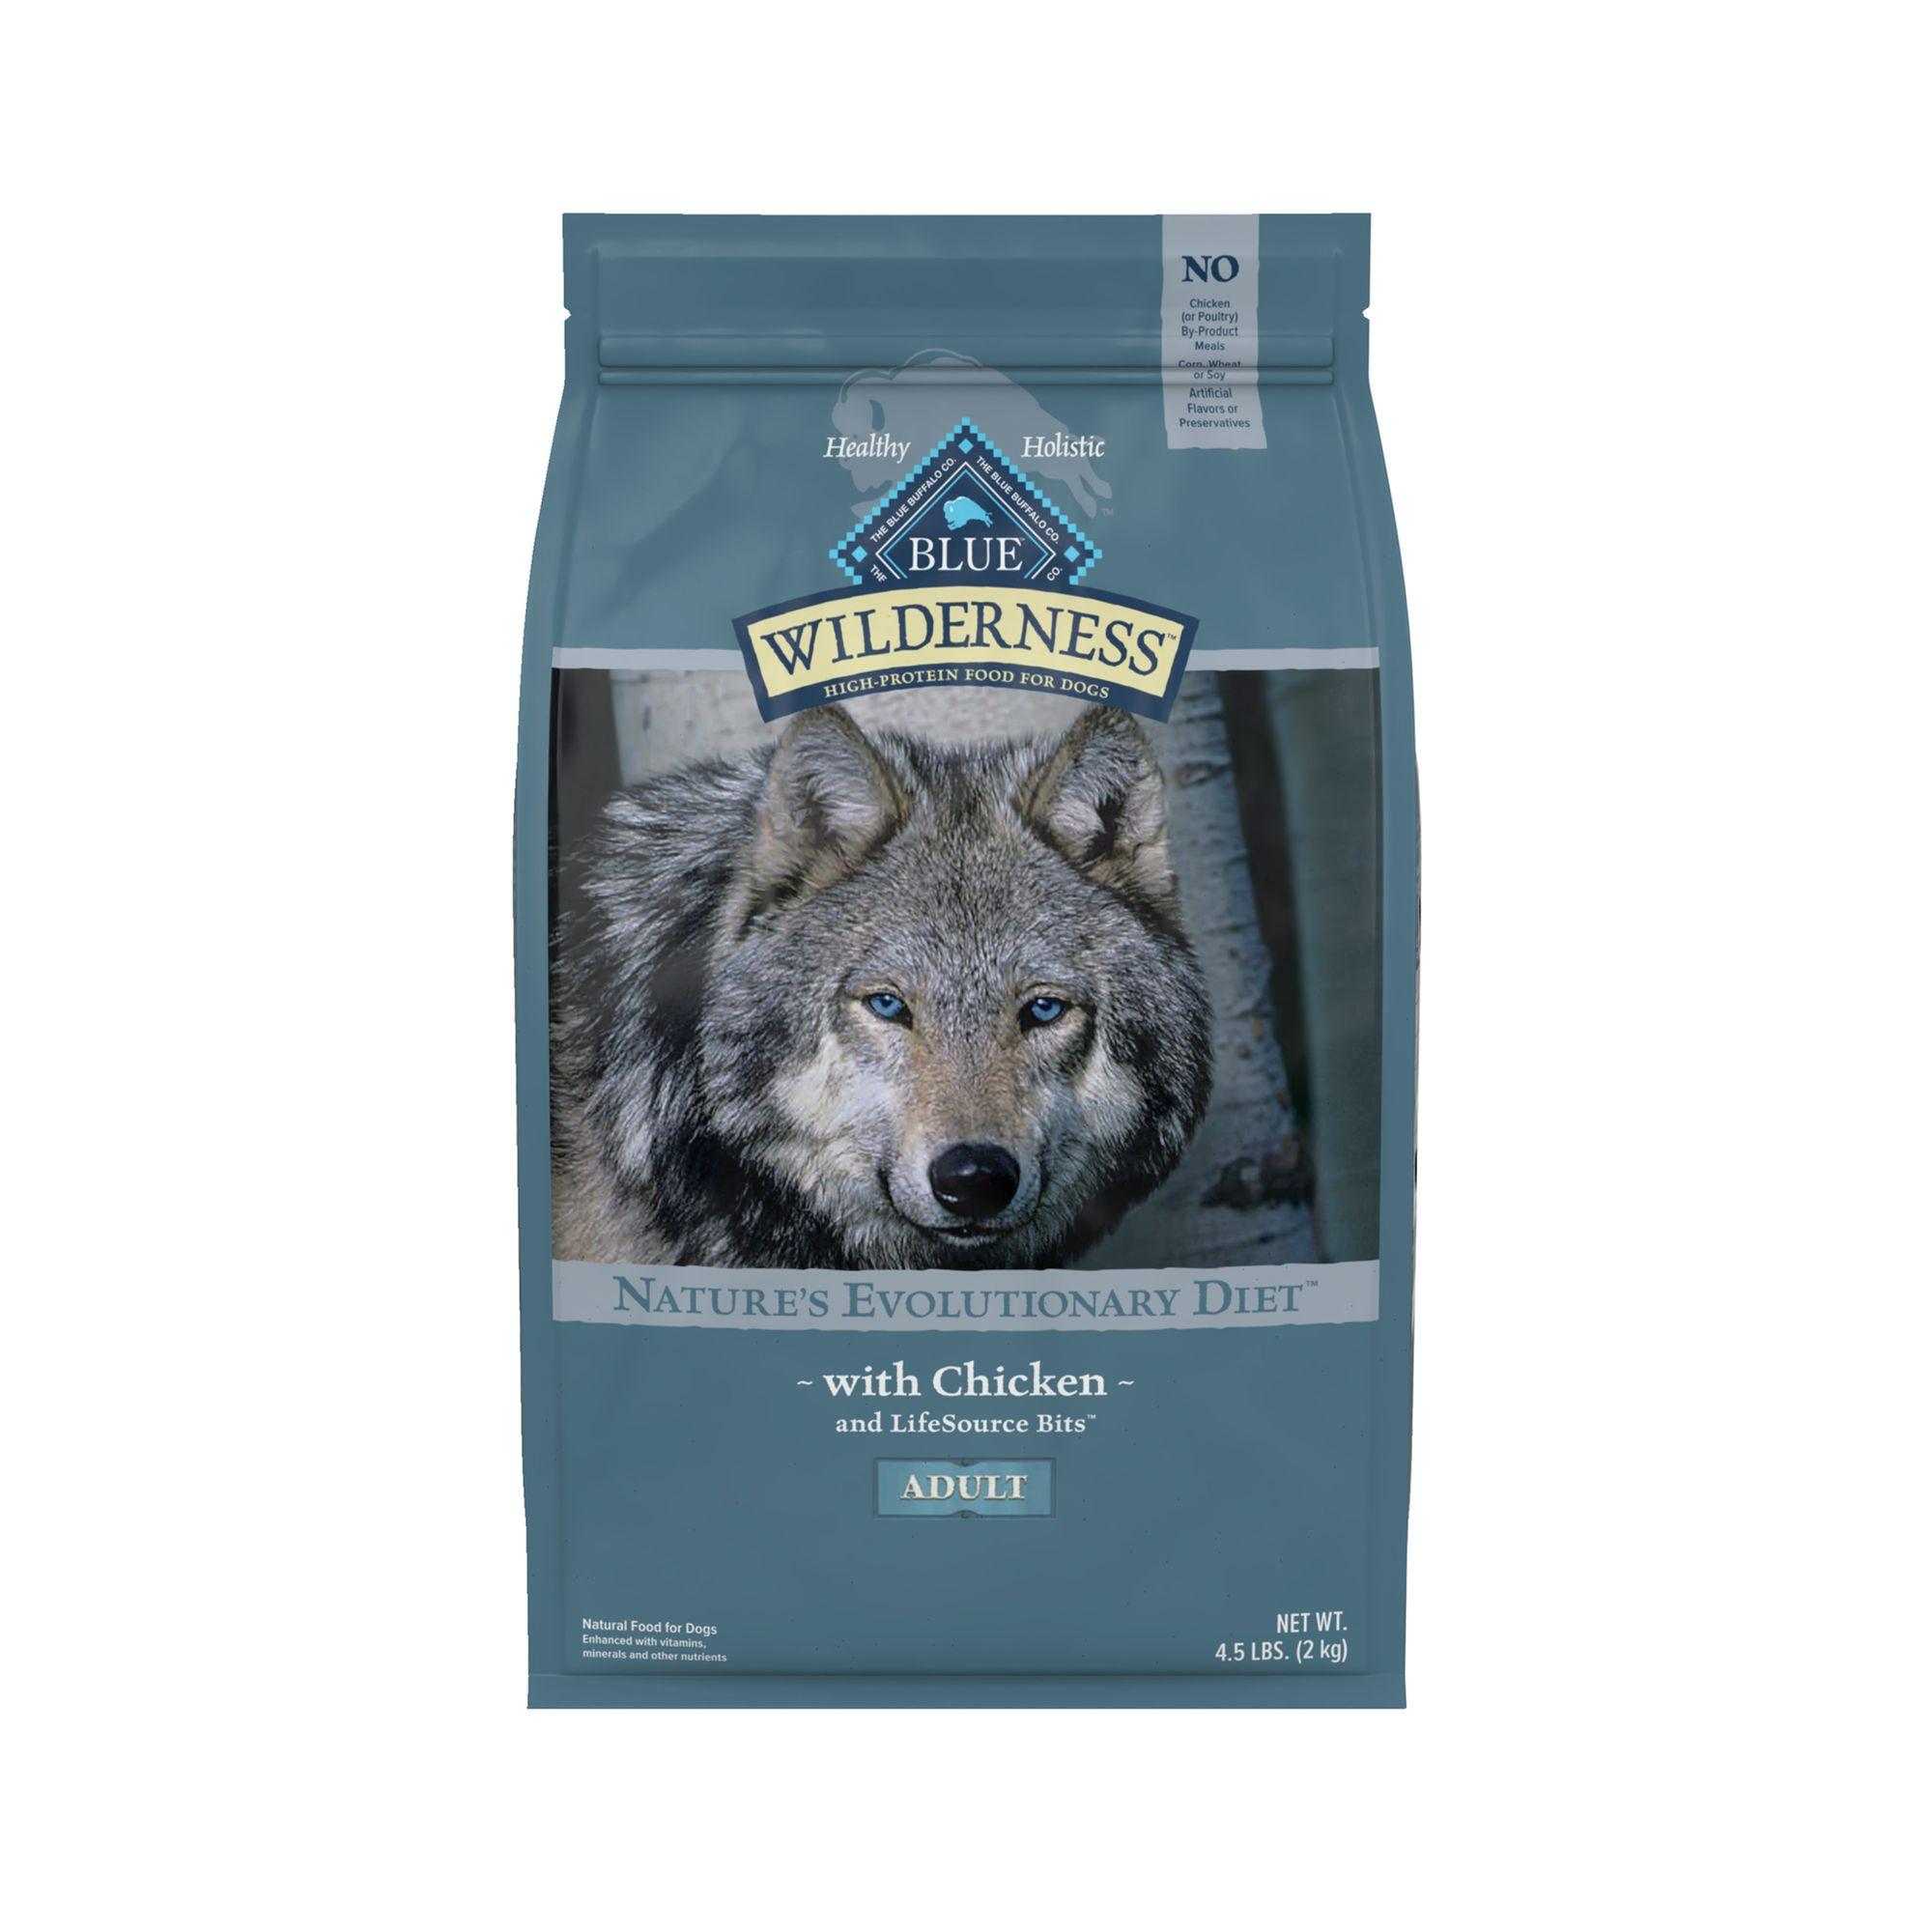 Blue Buffalo Wilderness Adult Dog Food Grain Free Natural Chicken